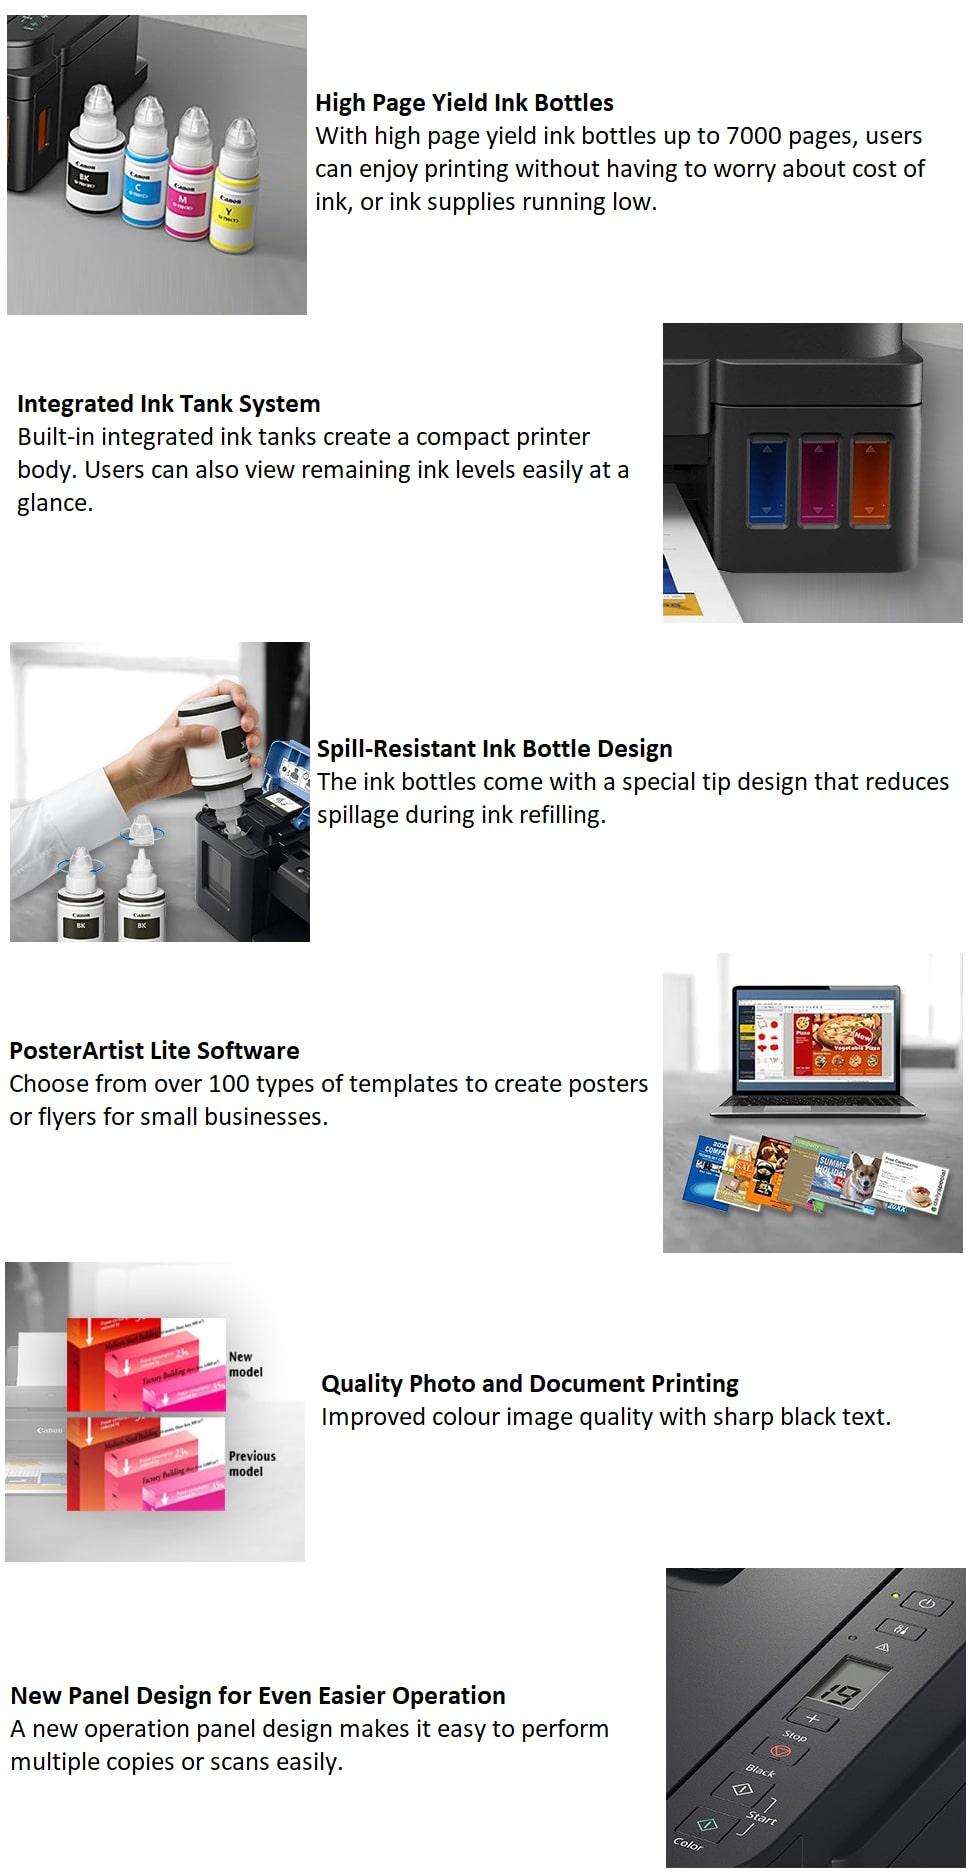 https://assetscdn1.paytm.com/images/catalog/product/L/LA/LARCANON-PIXMA-NATI57159BCF6A5E0/9.png